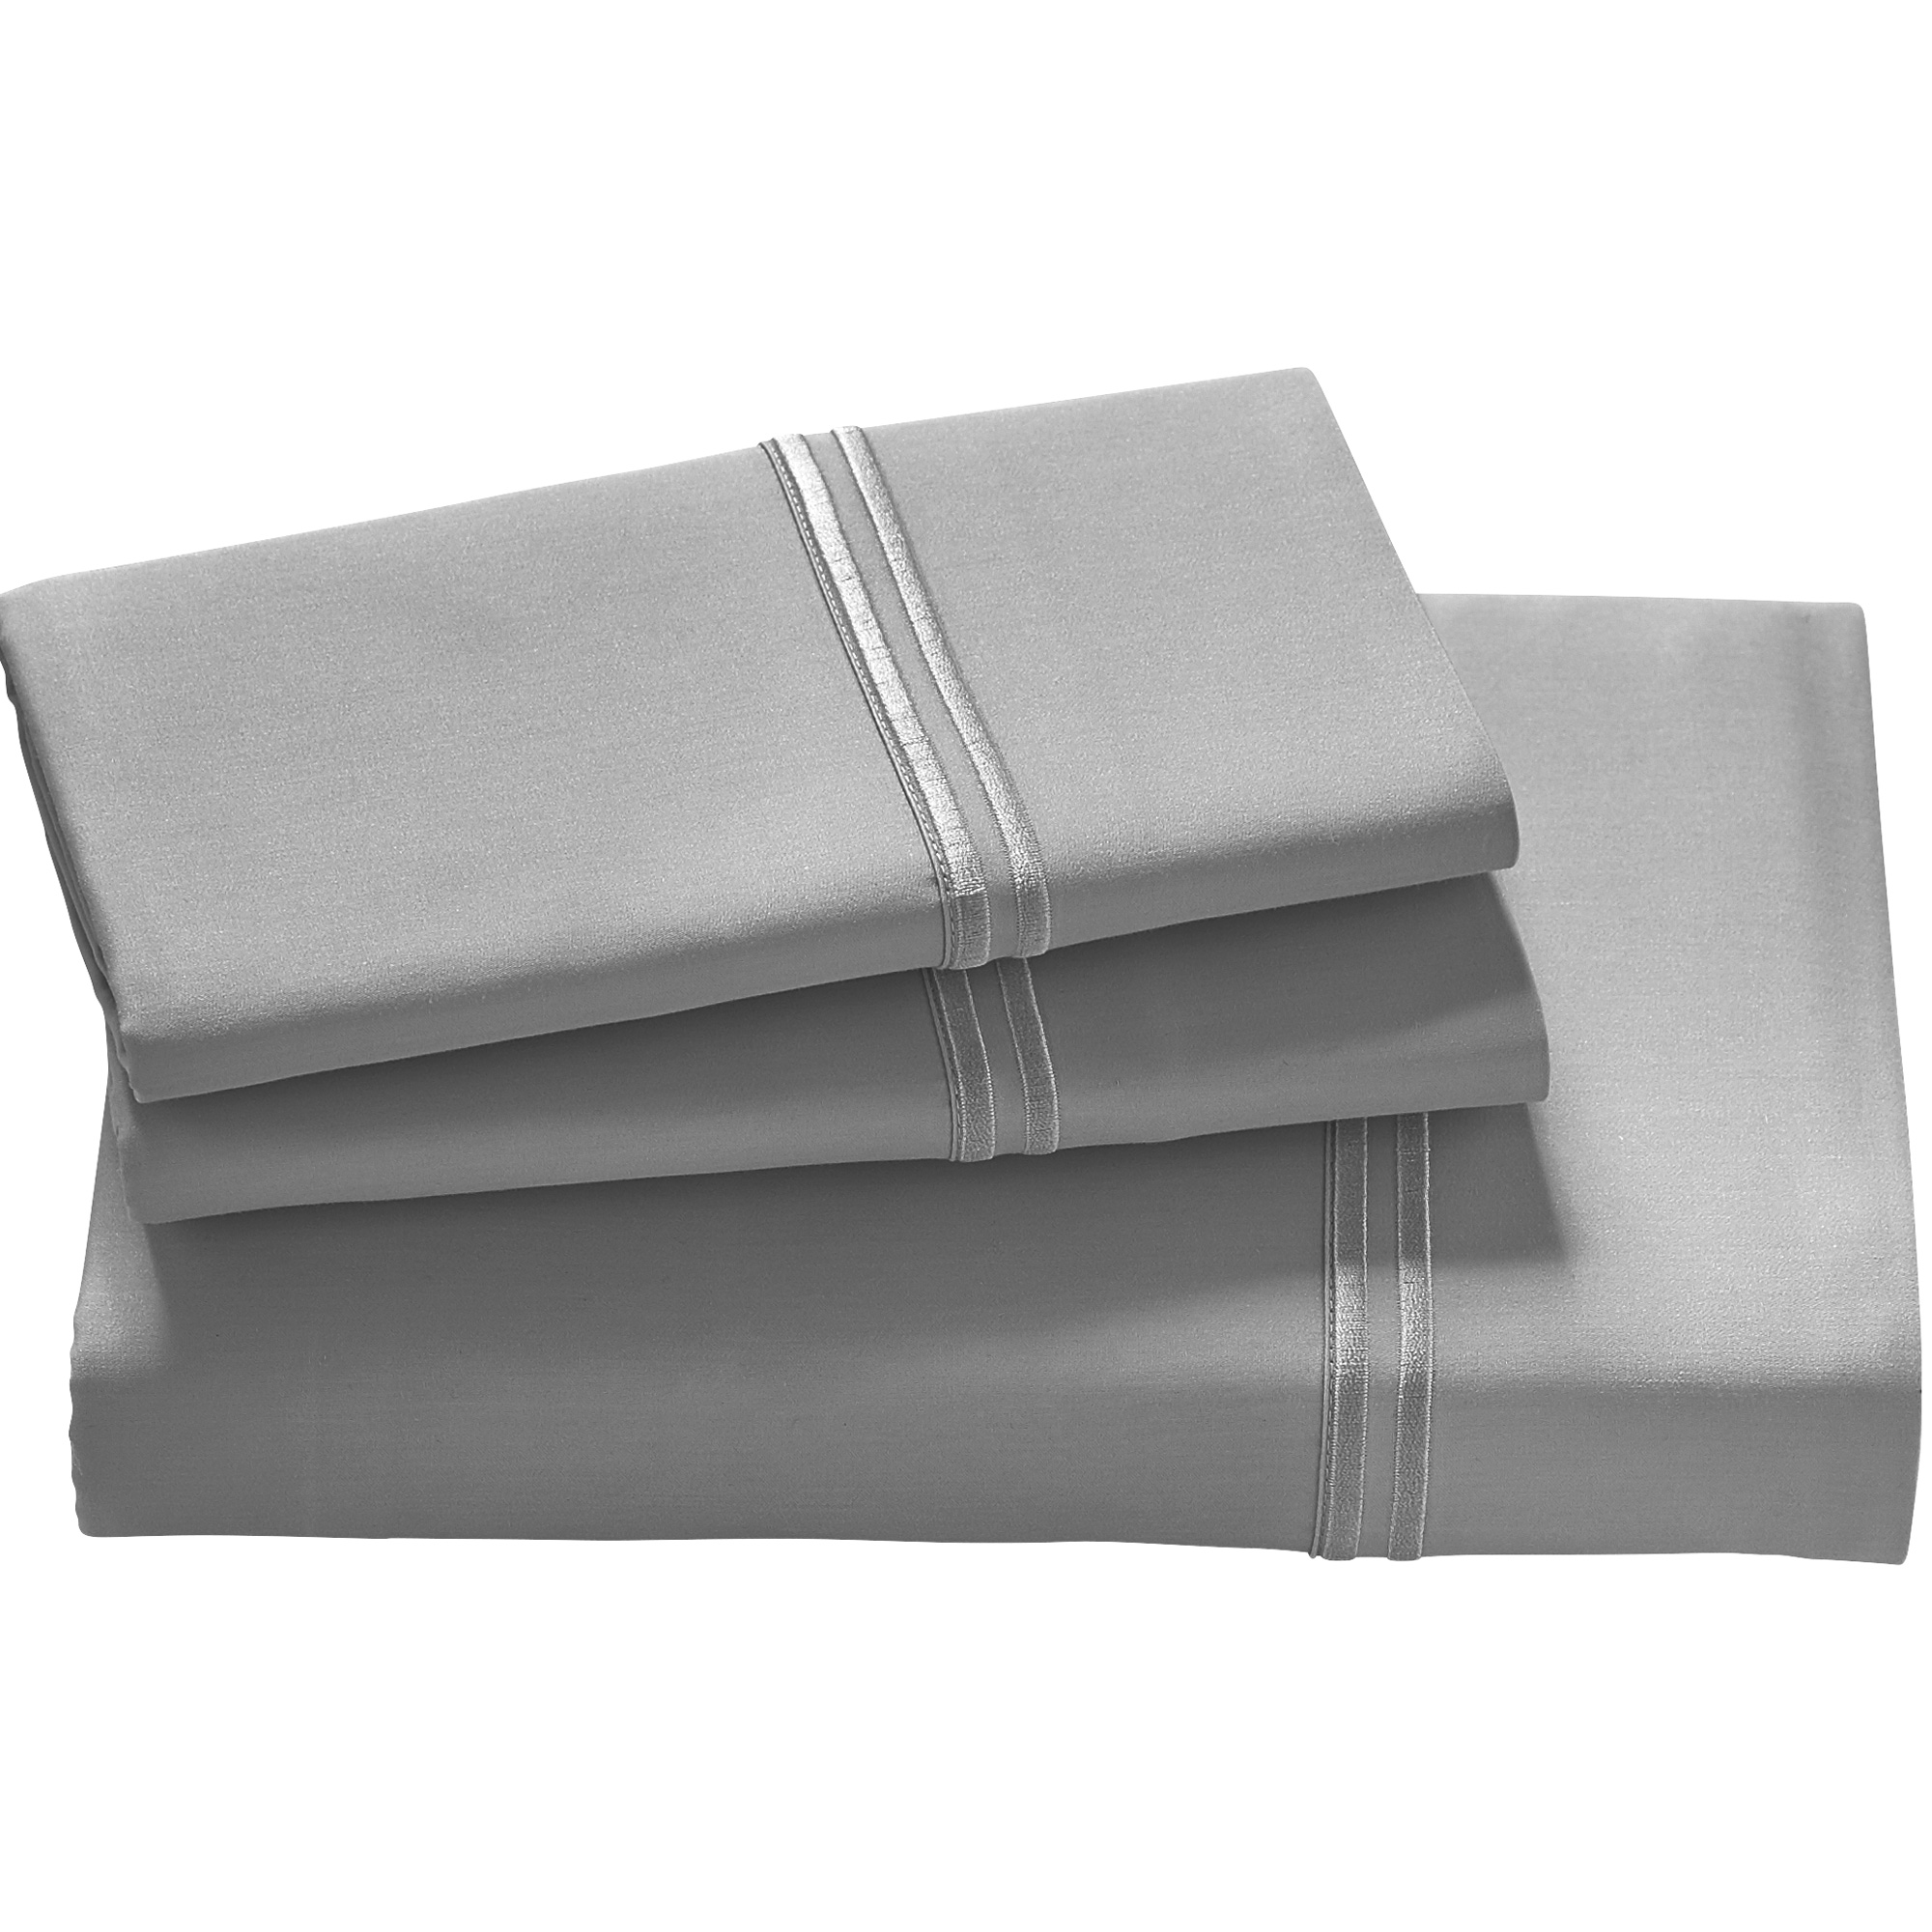 Purecare | Elements Dove Gray Split King Modal Sheet Set